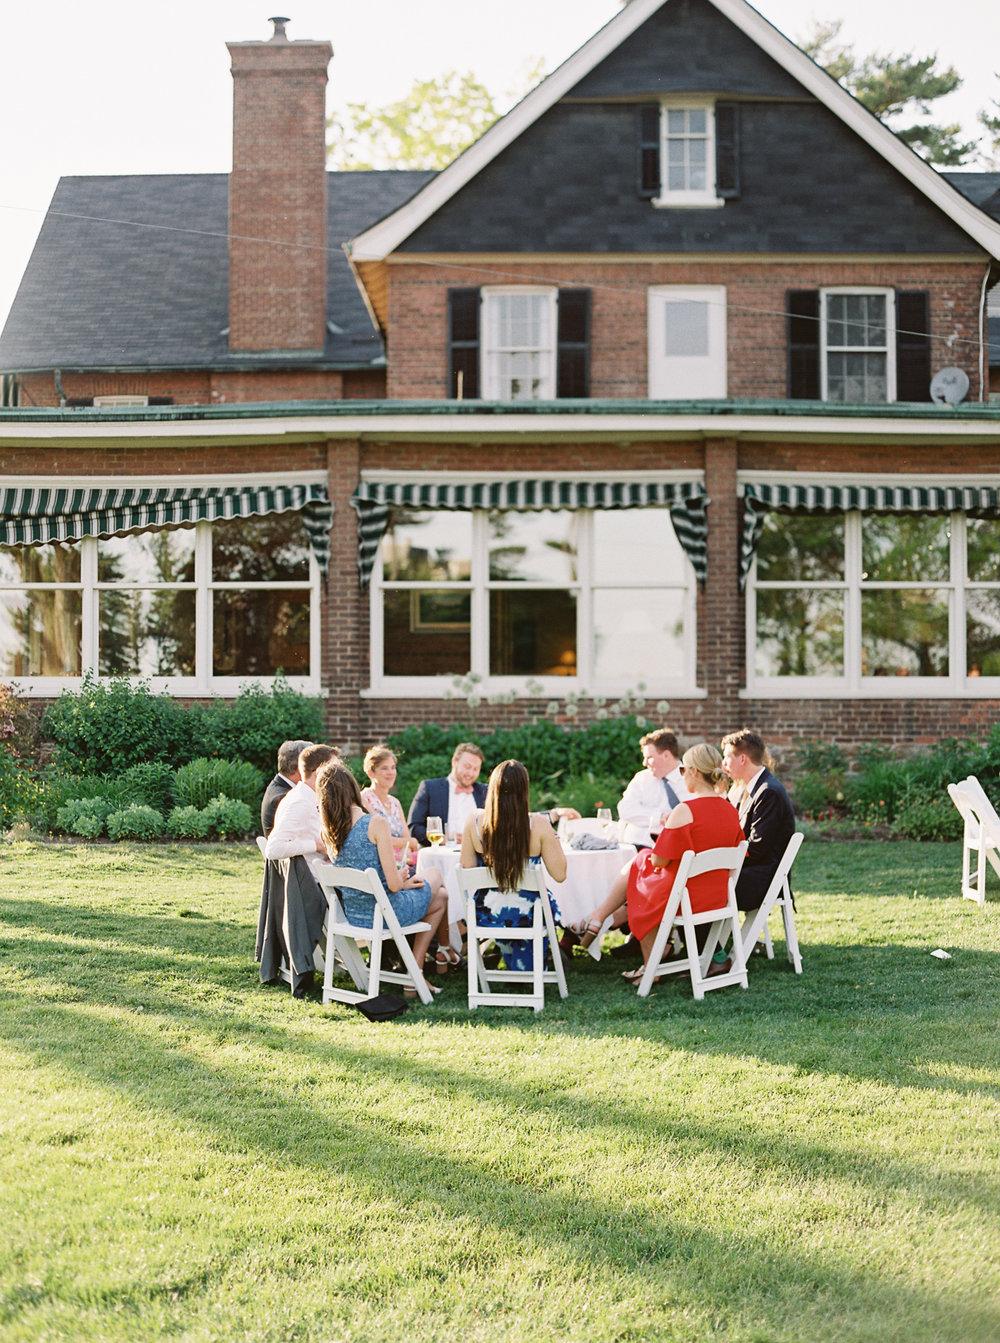 0286-Nadia-Chris-Married-When He Founf Her-Toronto Golf Club.jpg